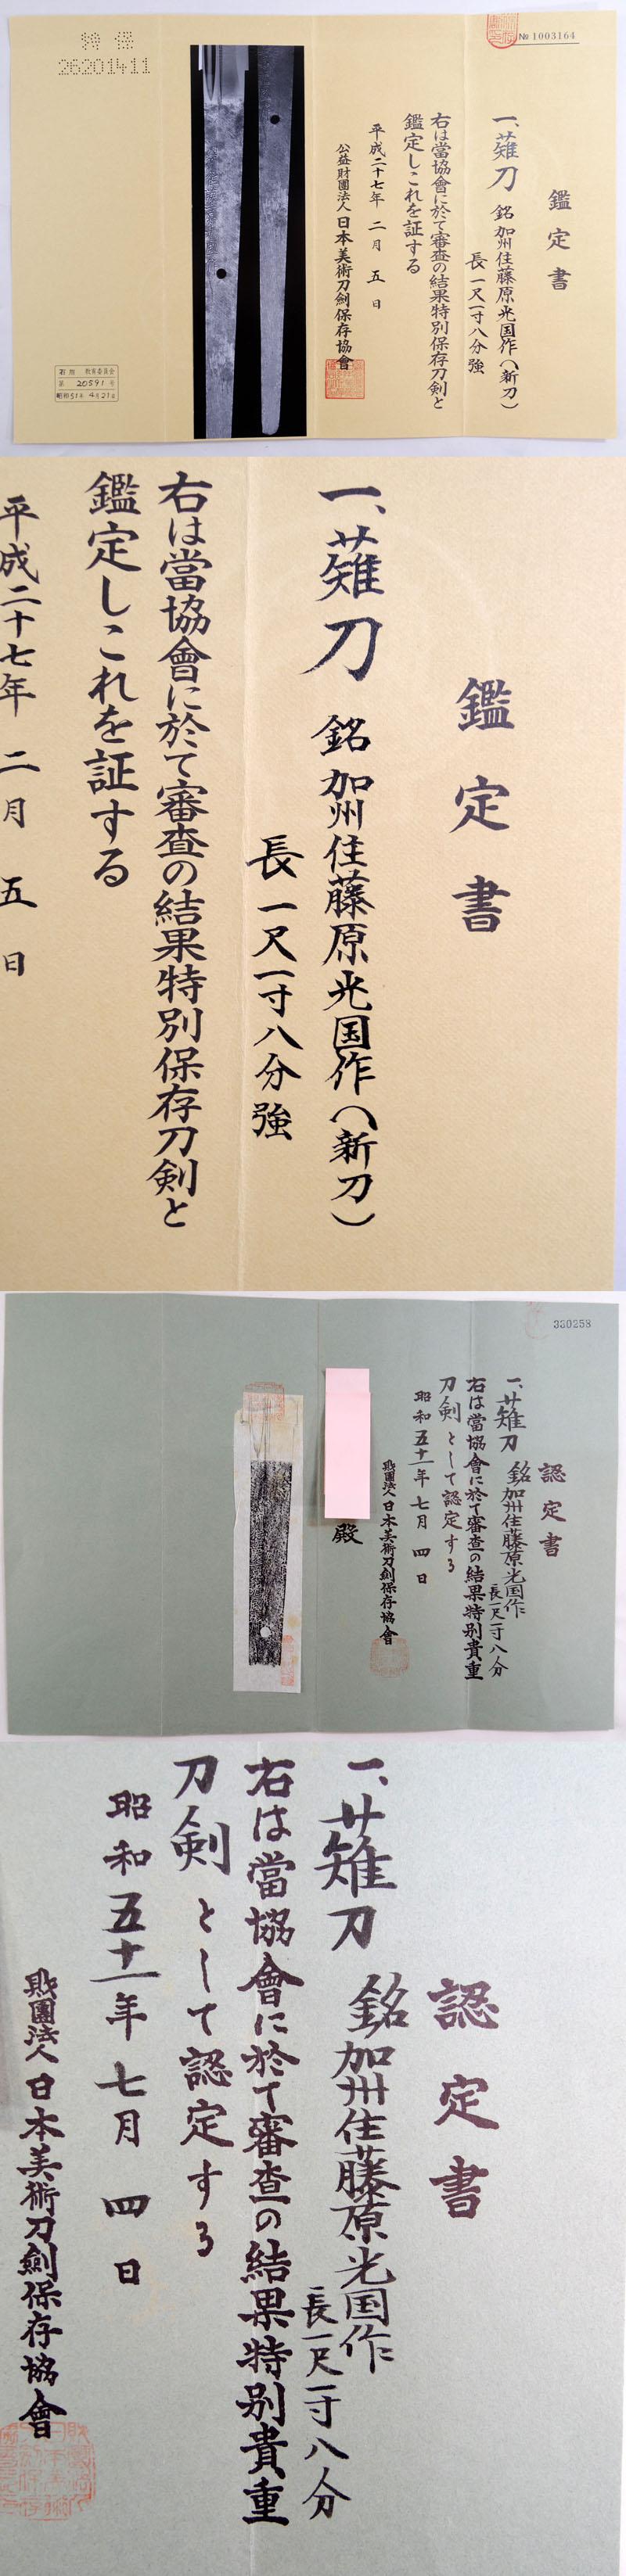 加州住藤原光国作 Picture of Certificate